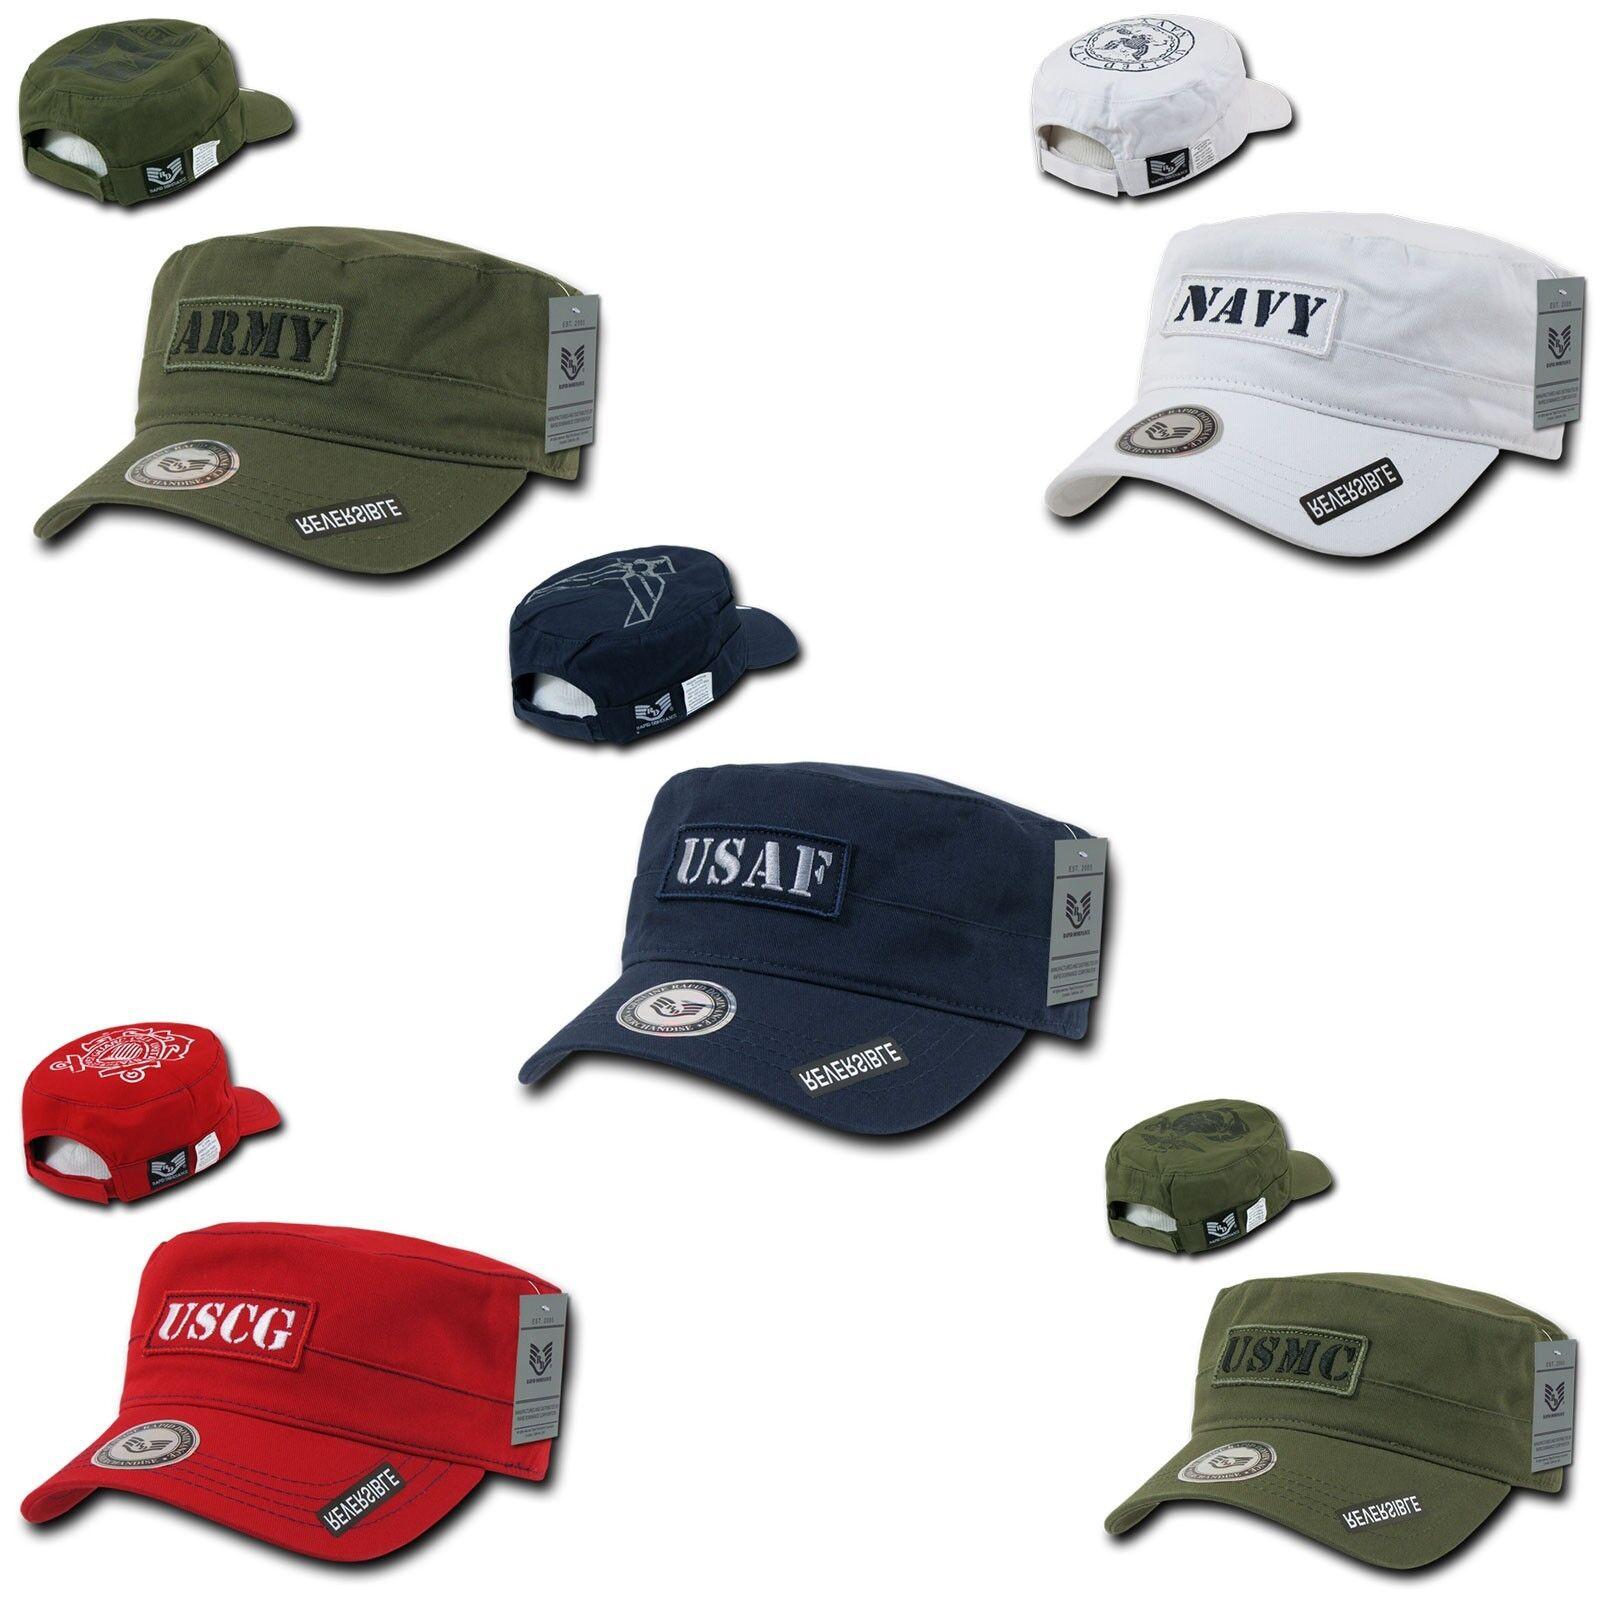 US Army Navy USMC USCG Fatigue USAF BDU Reversible Patrol Fatigue USCG Cadet Cotton Caps Hats 2c441b